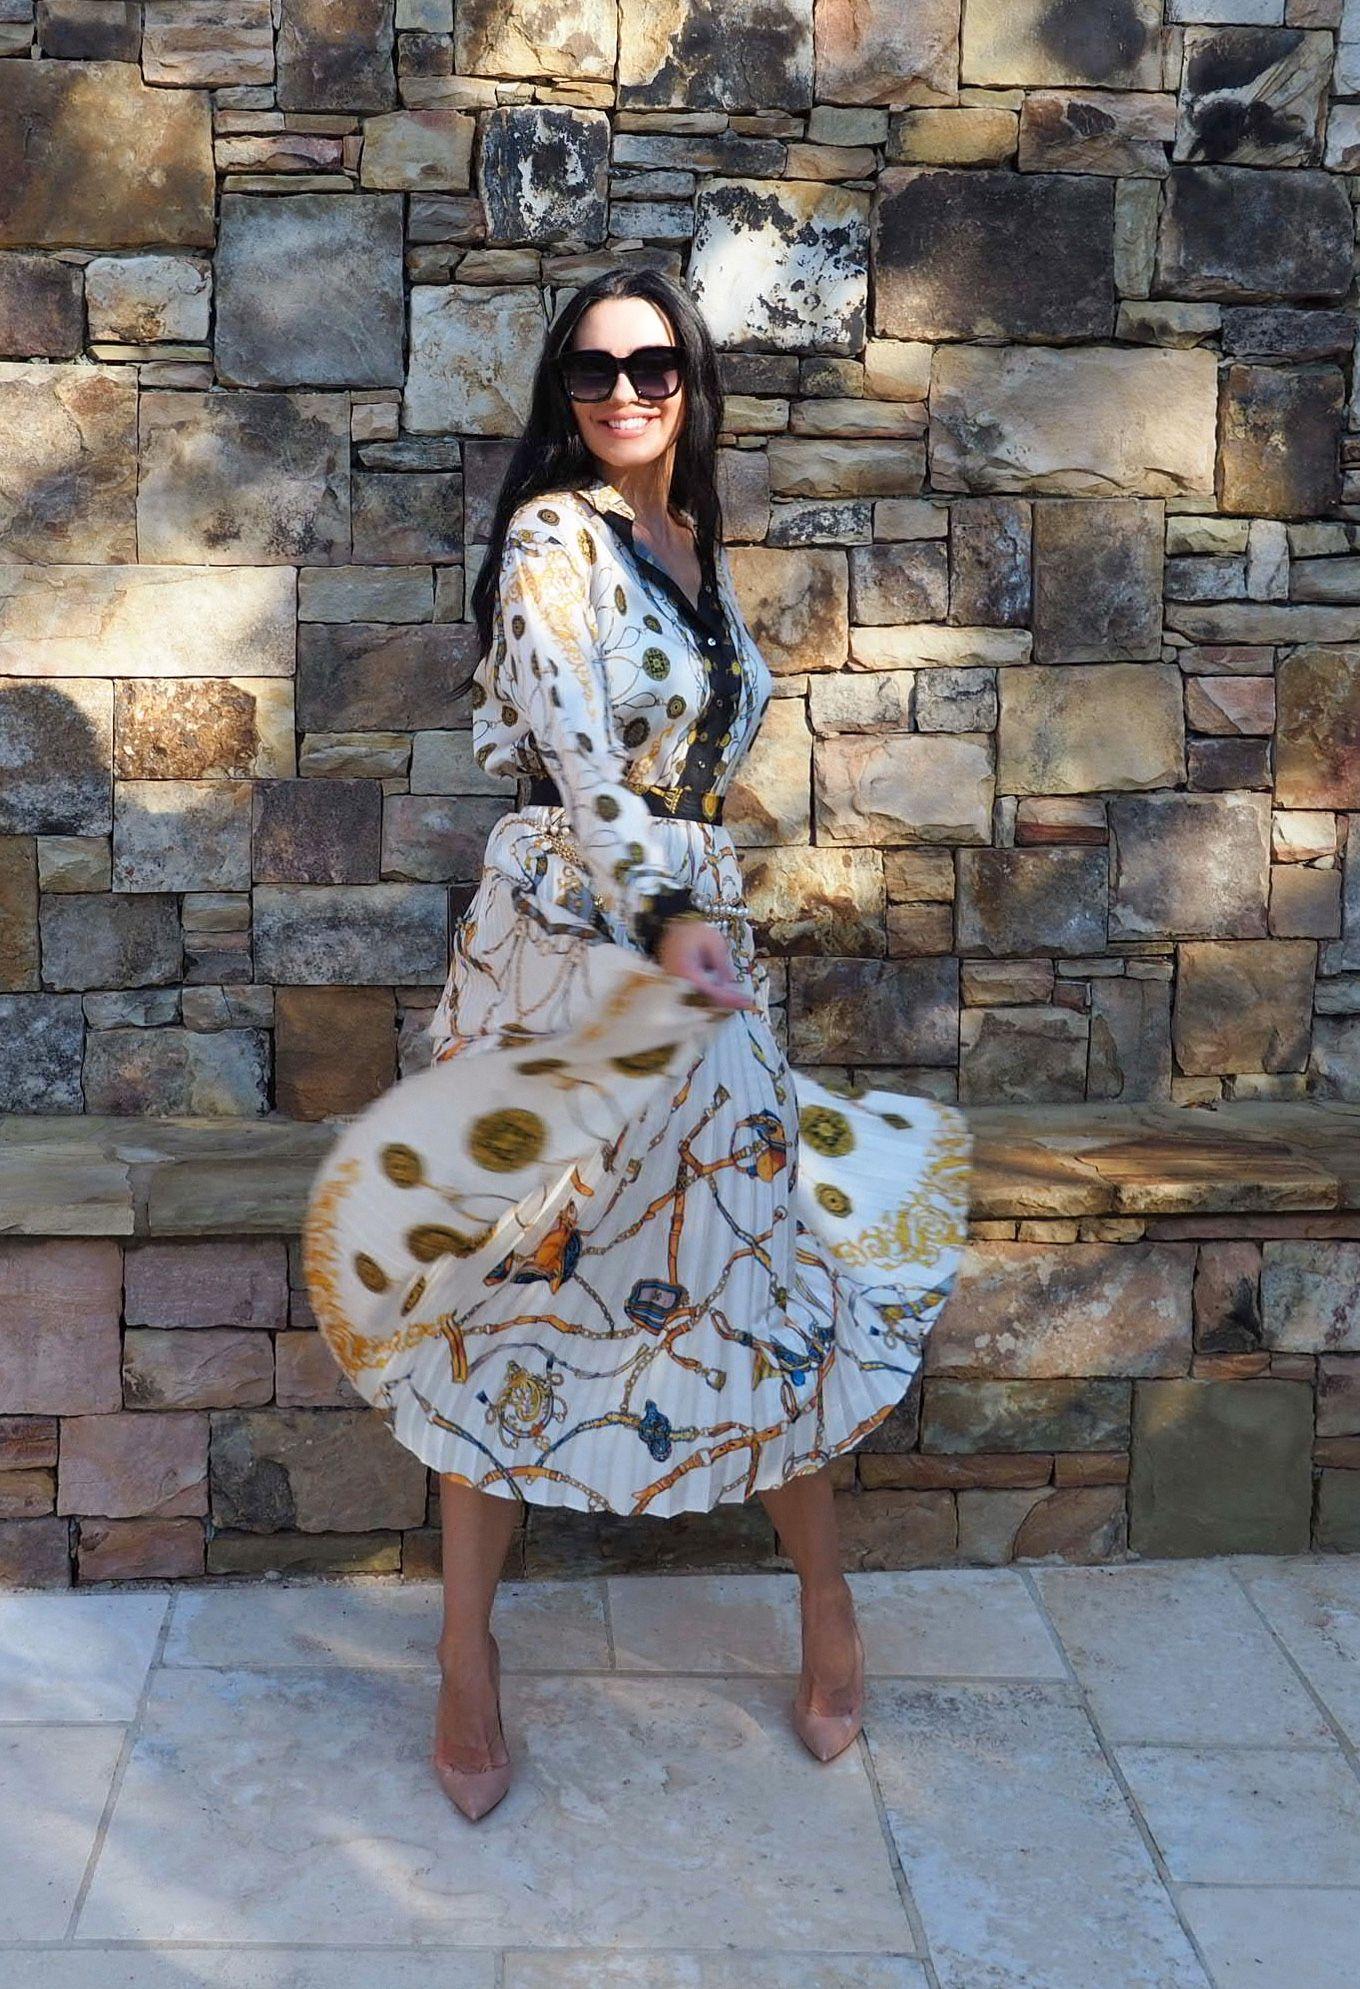 3ebde864 Zara, Scarf print, ZARA chain print pleated skirt, ZARA chain print shirt,  Scarf print skirt, Scarf print shirt, Louboutins, Statement outfit,  Workwear, ...